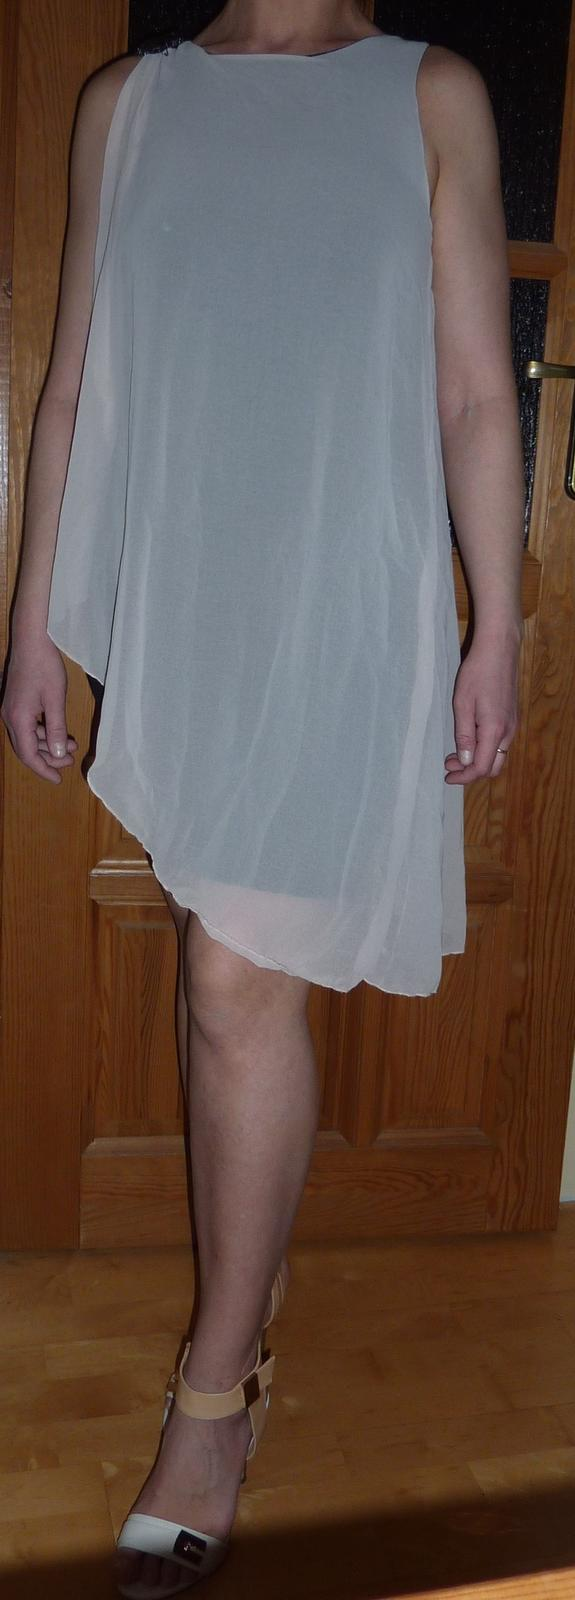 šik talianske šaty - Obrázok č. 3